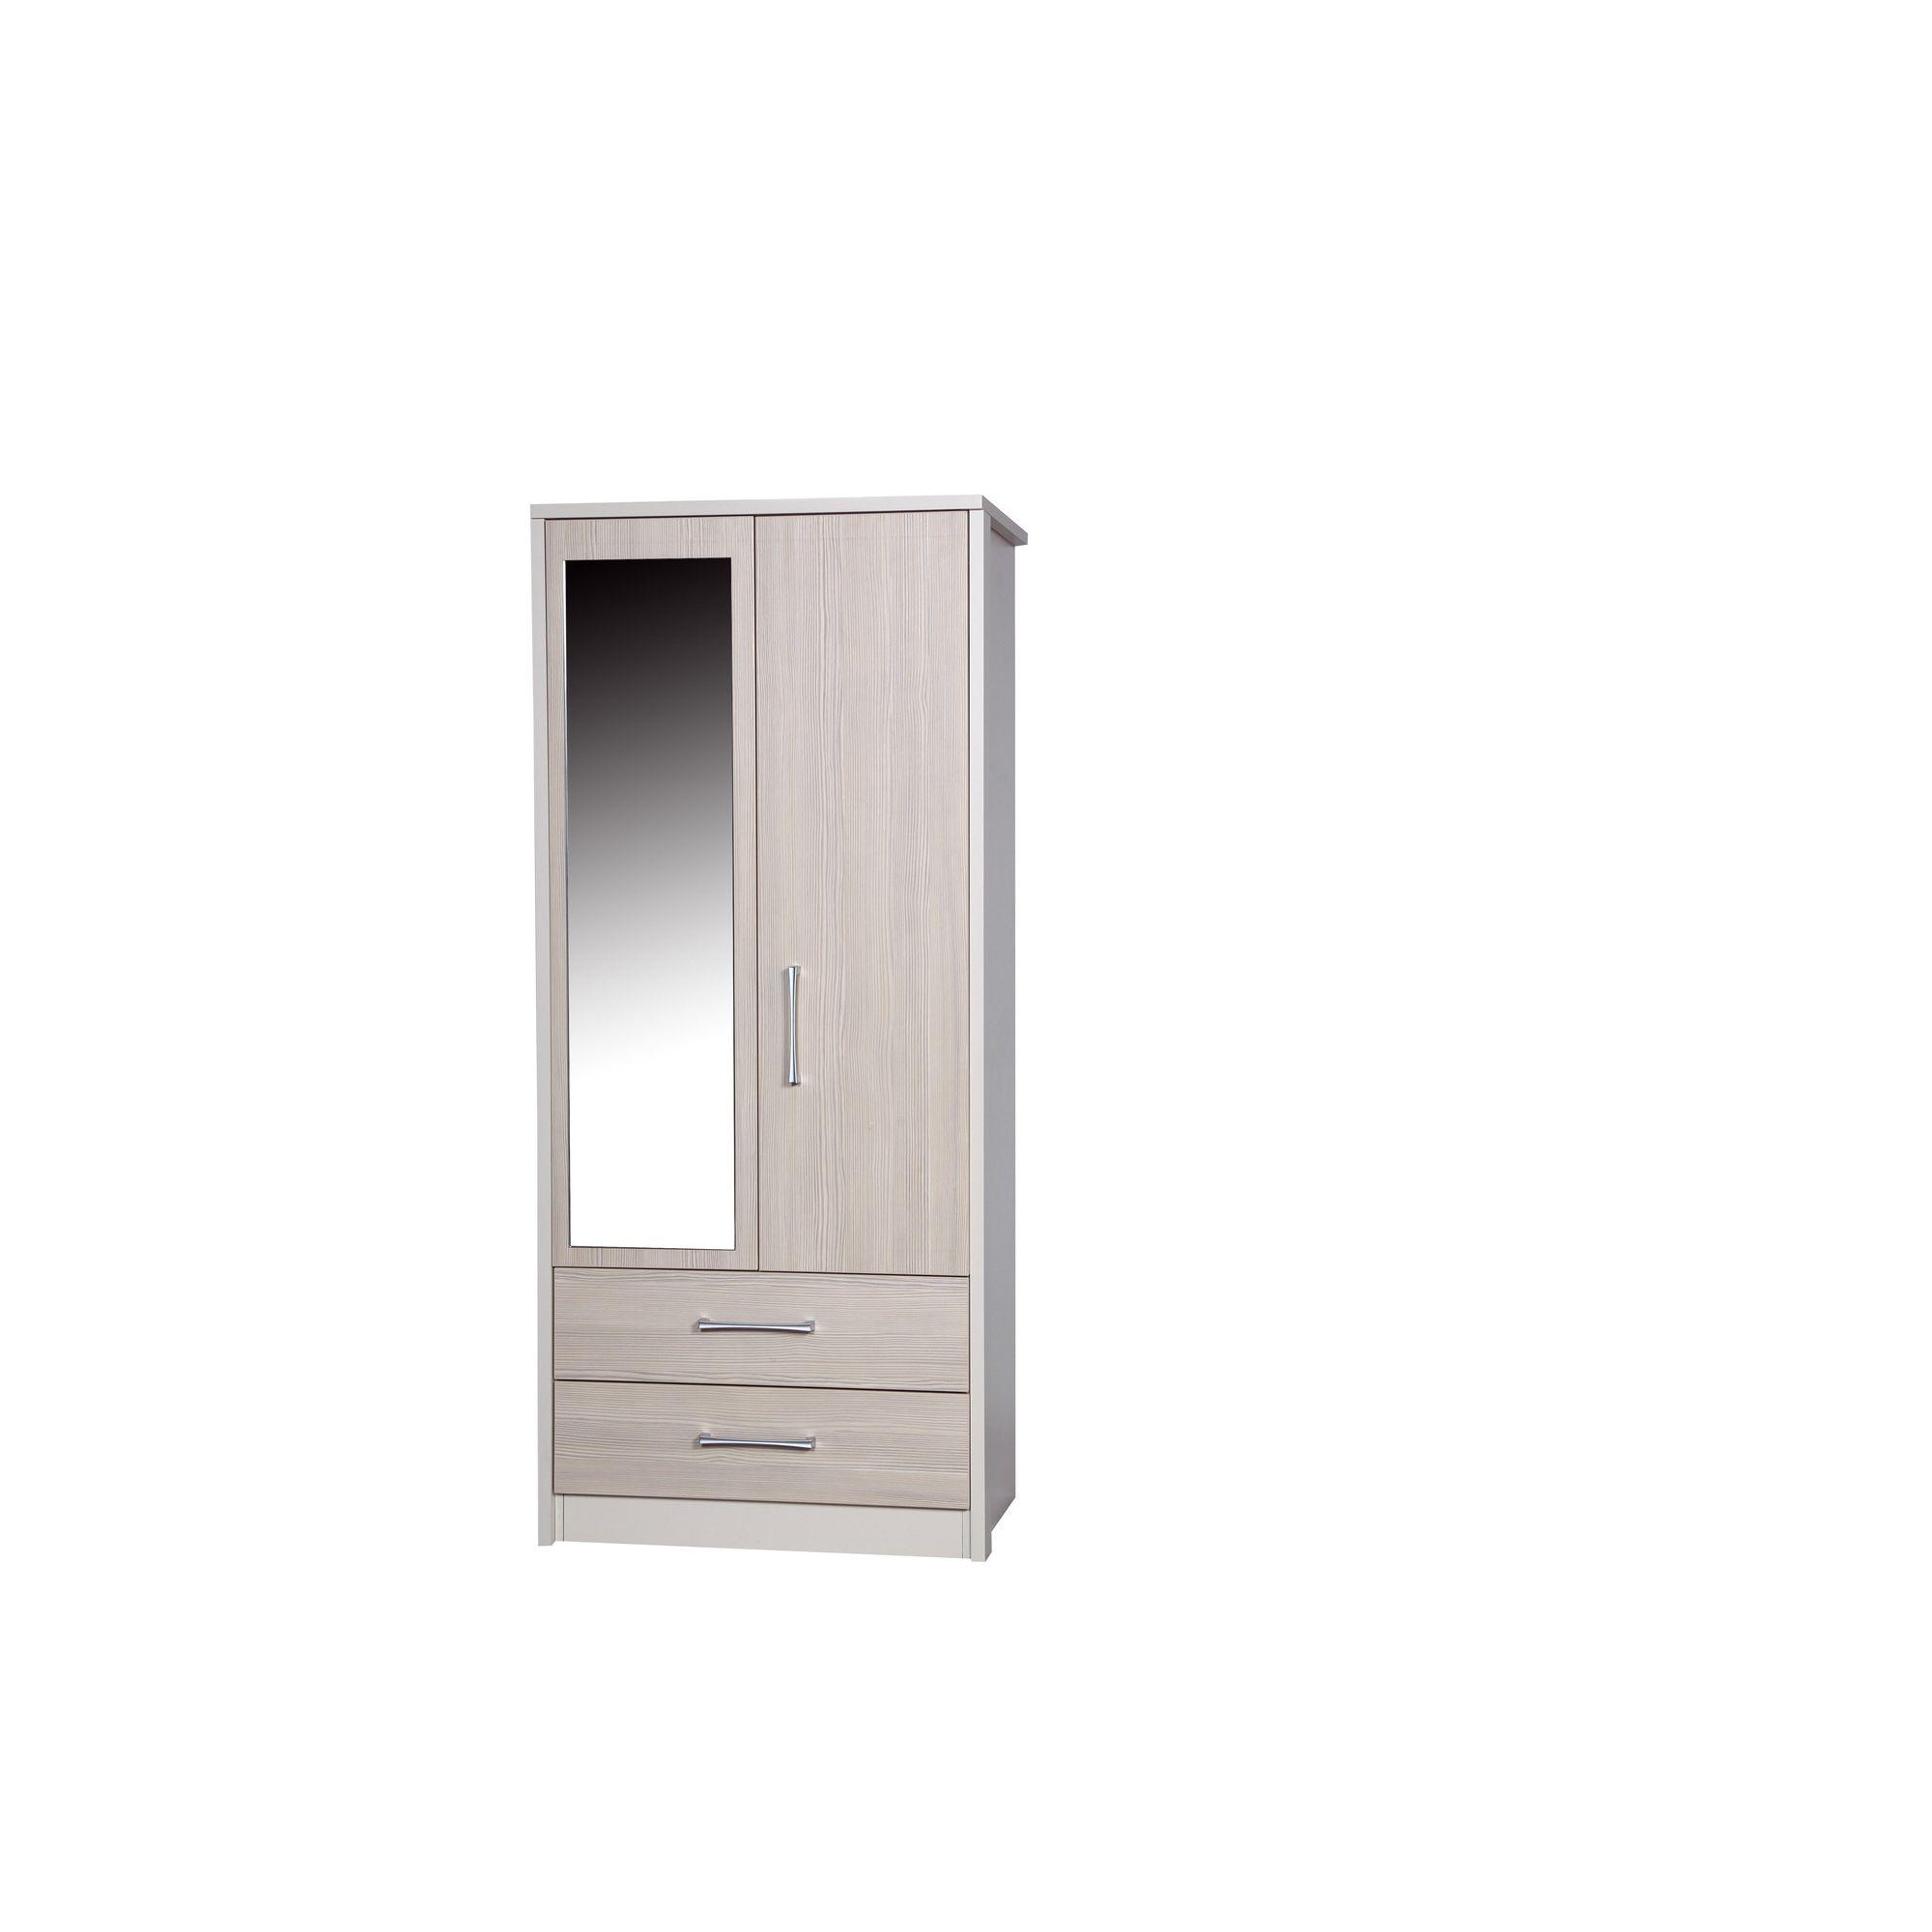 Alto Furniture Avola 2 Drawer Combi Wardrobe with Mirror - Cream Carcass With Grey Avola at Tesco Direct